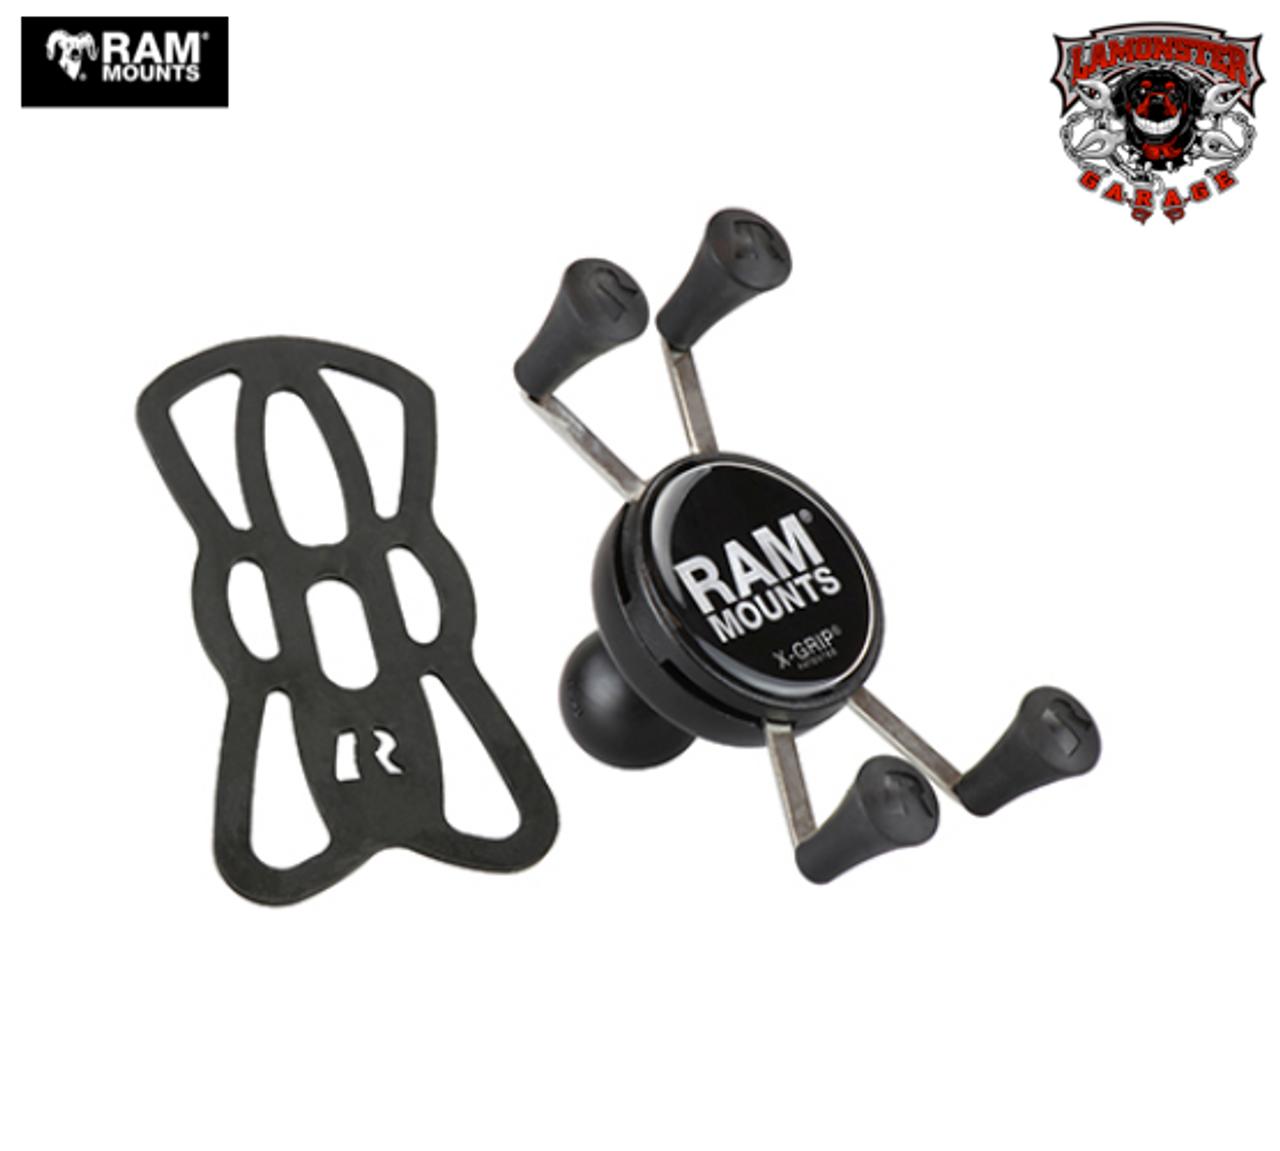 "RAM® X-Grip® Universal Phone Holder with 1"" Ball (RAM-UN7B) Lamonster Approved"